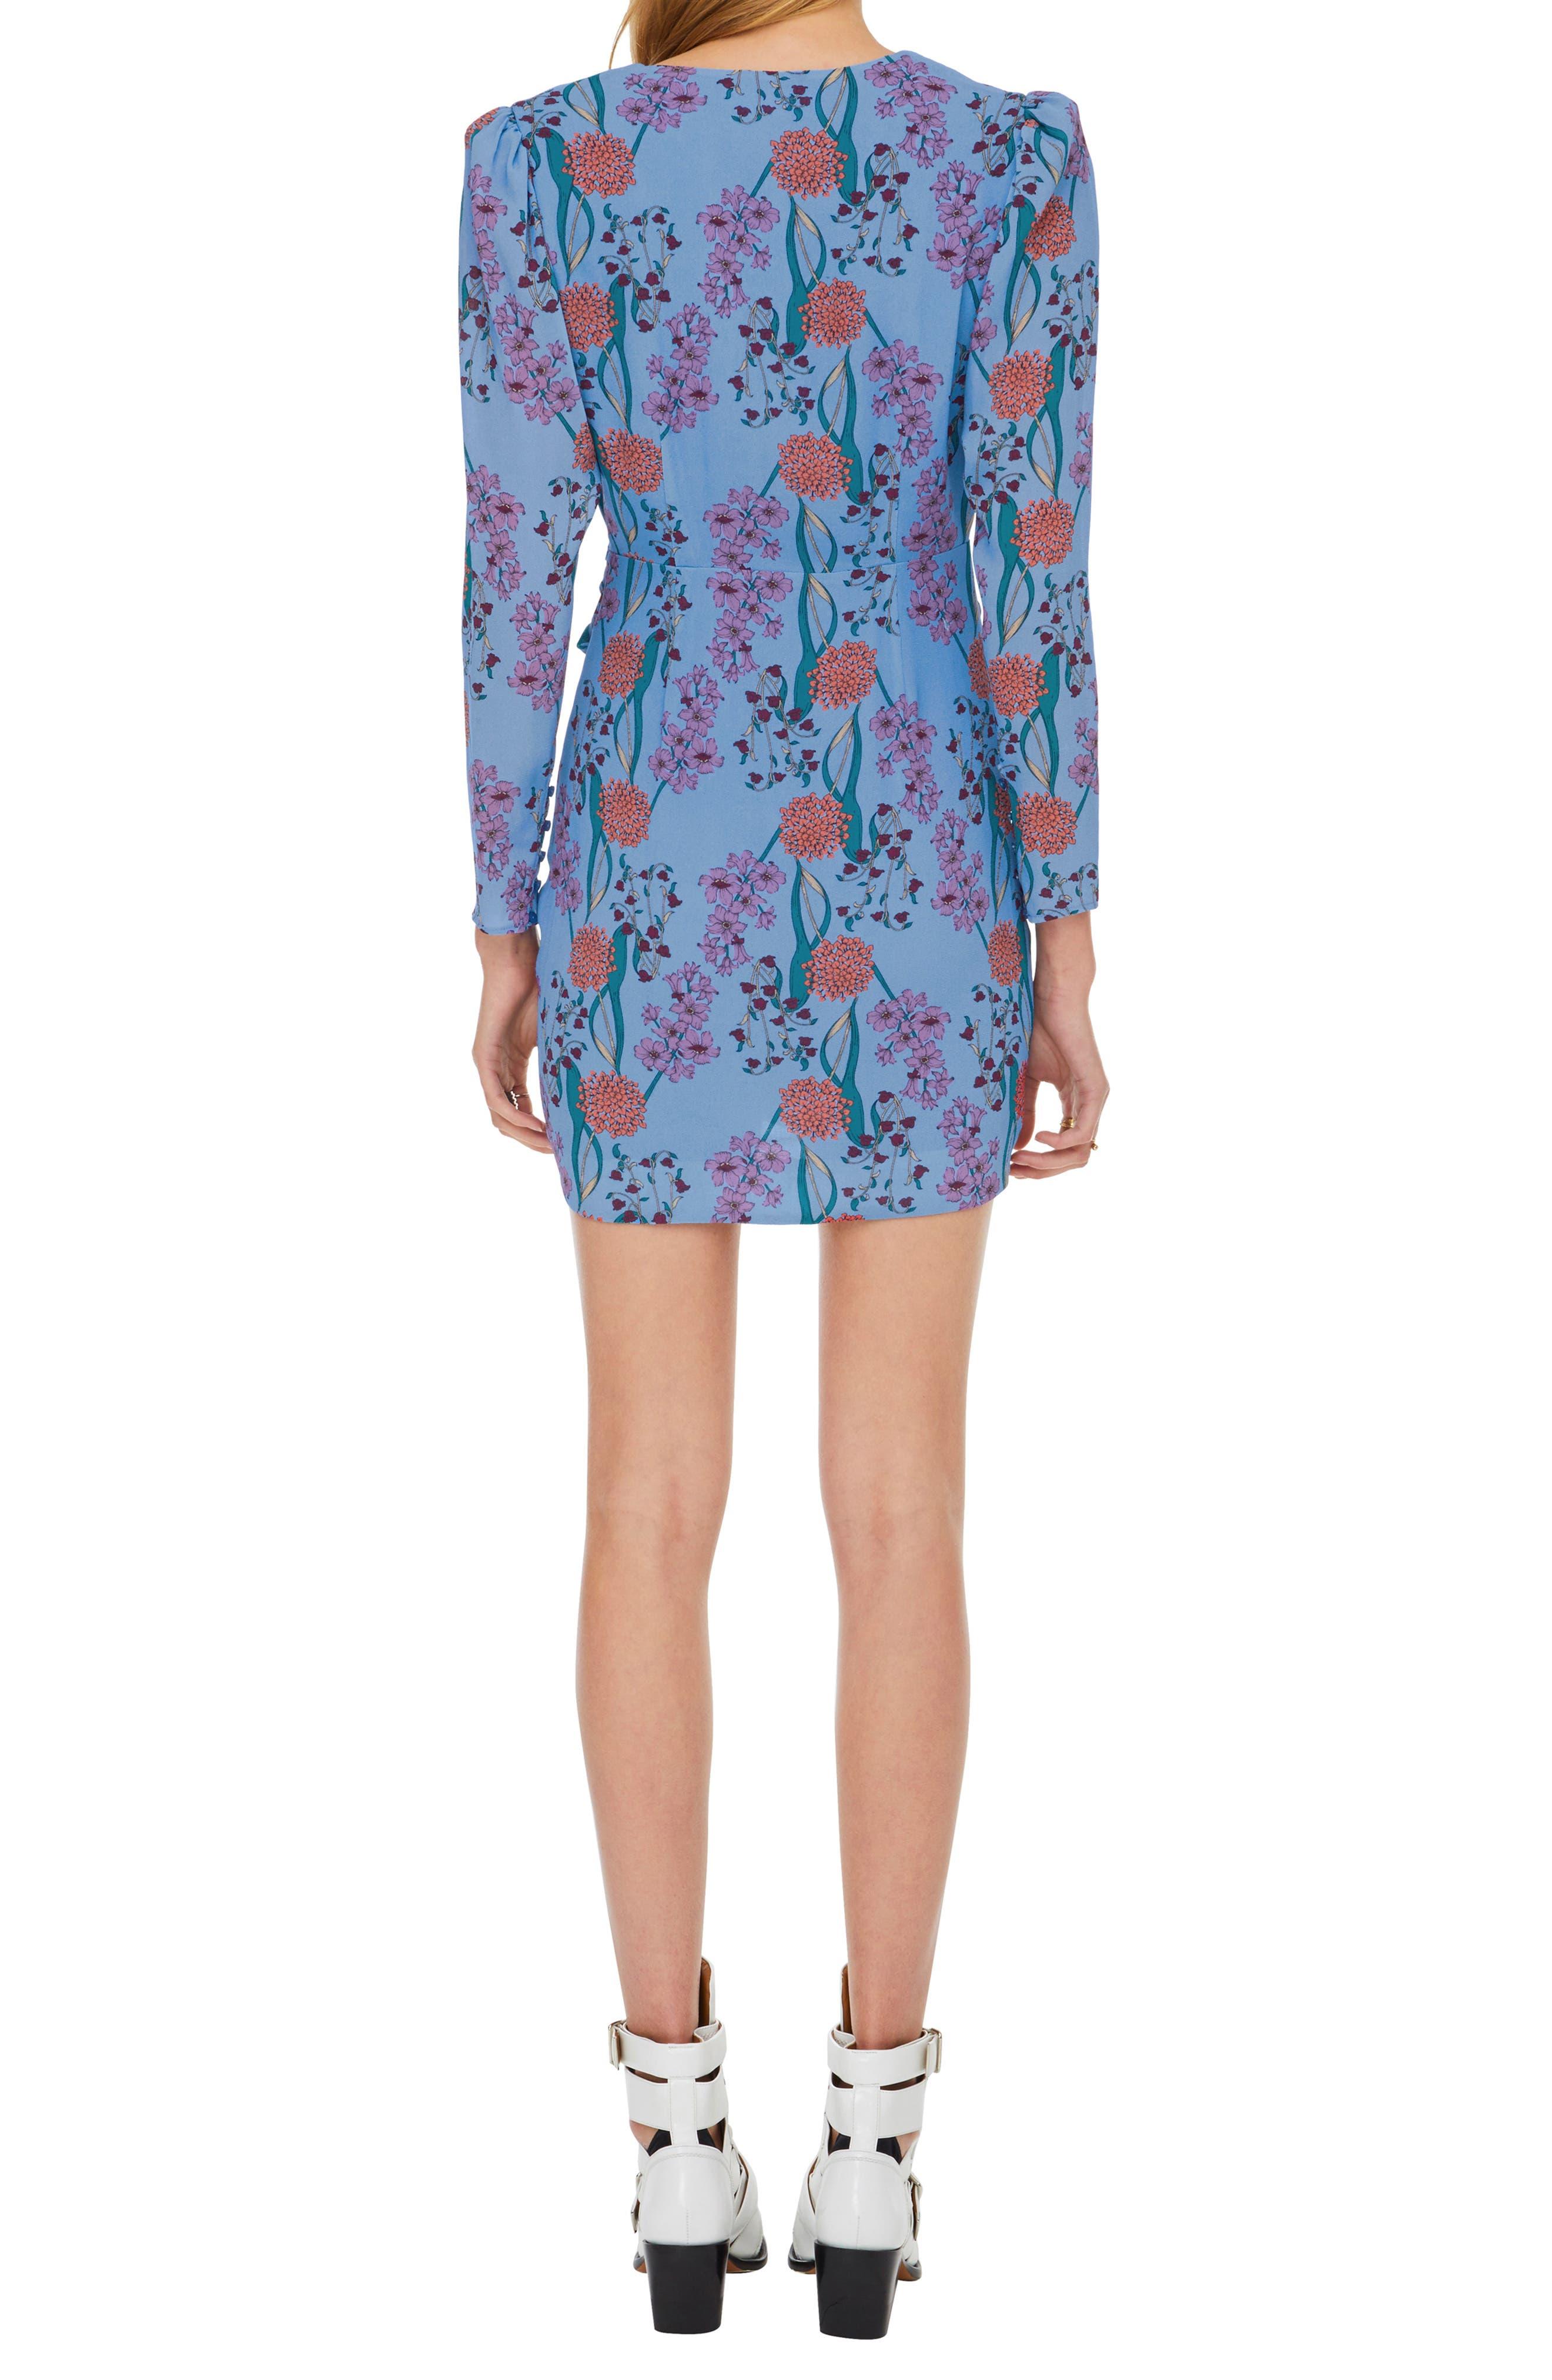 ASTR THE LABEL,                             Vignette Floral Print Dress,                             Alternate thumbnail 2, color,                             BLUEBELL FLORAL